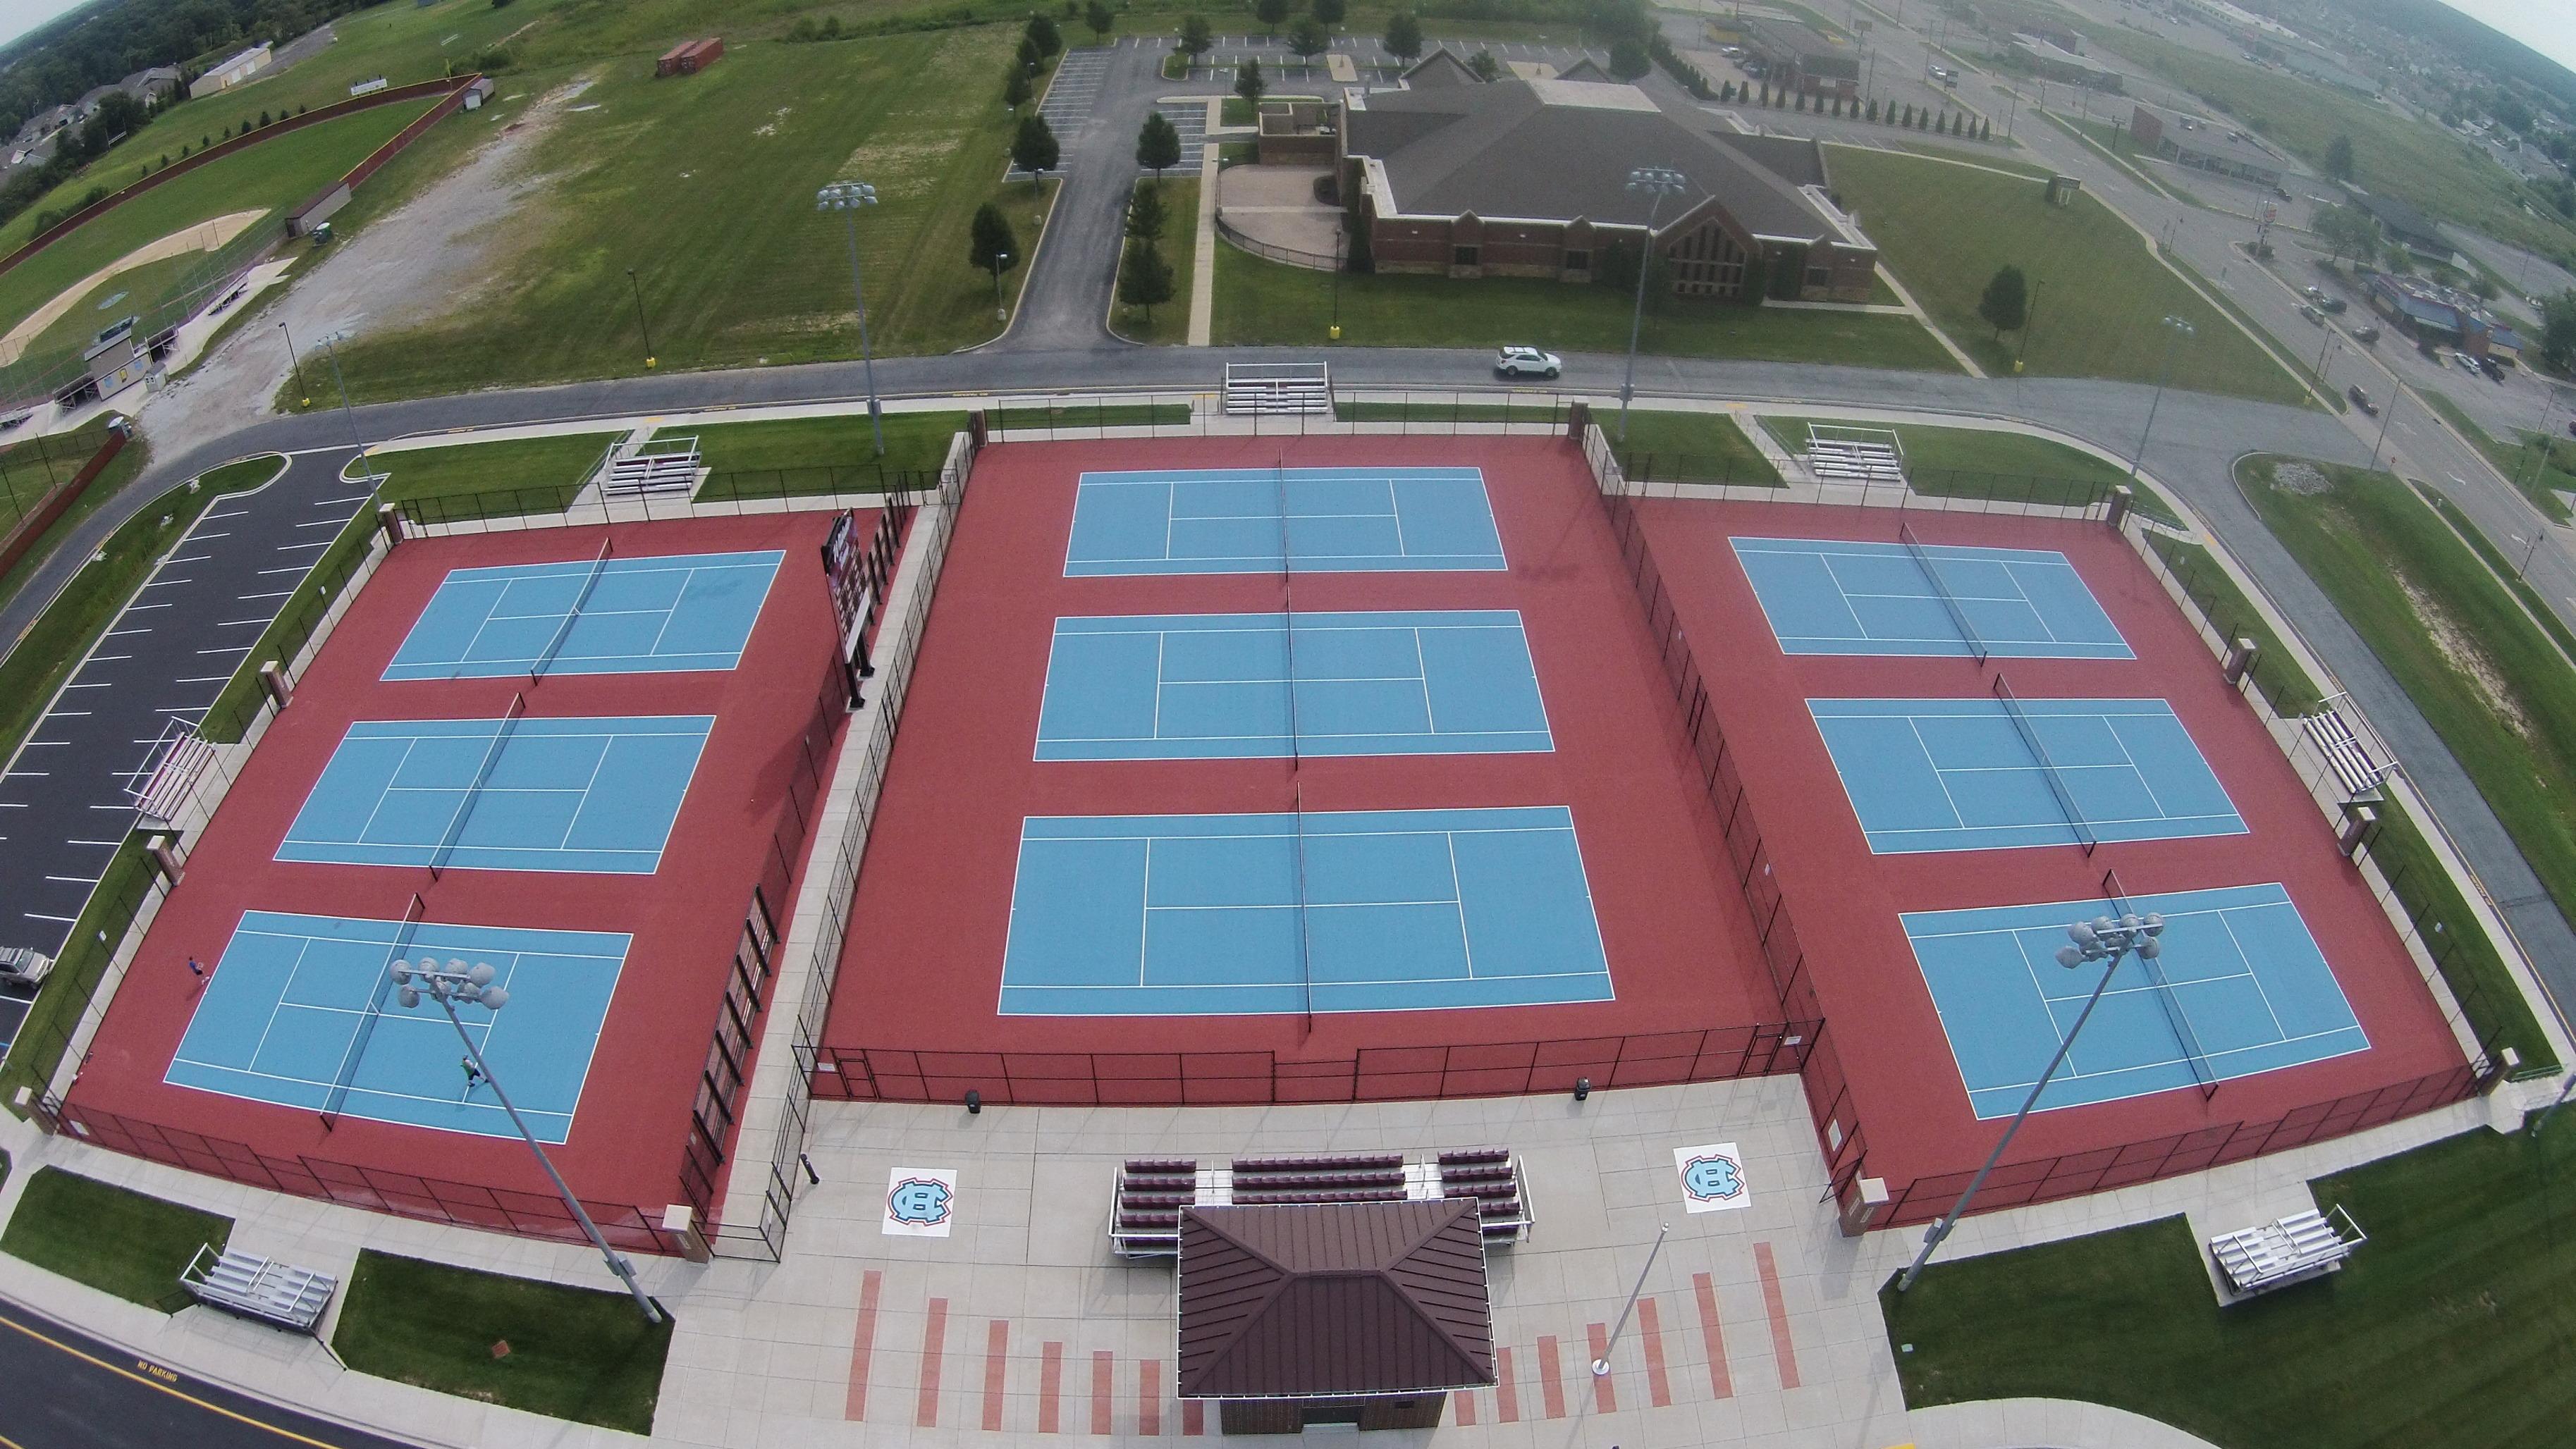 Boys' Tennis Open Hitting